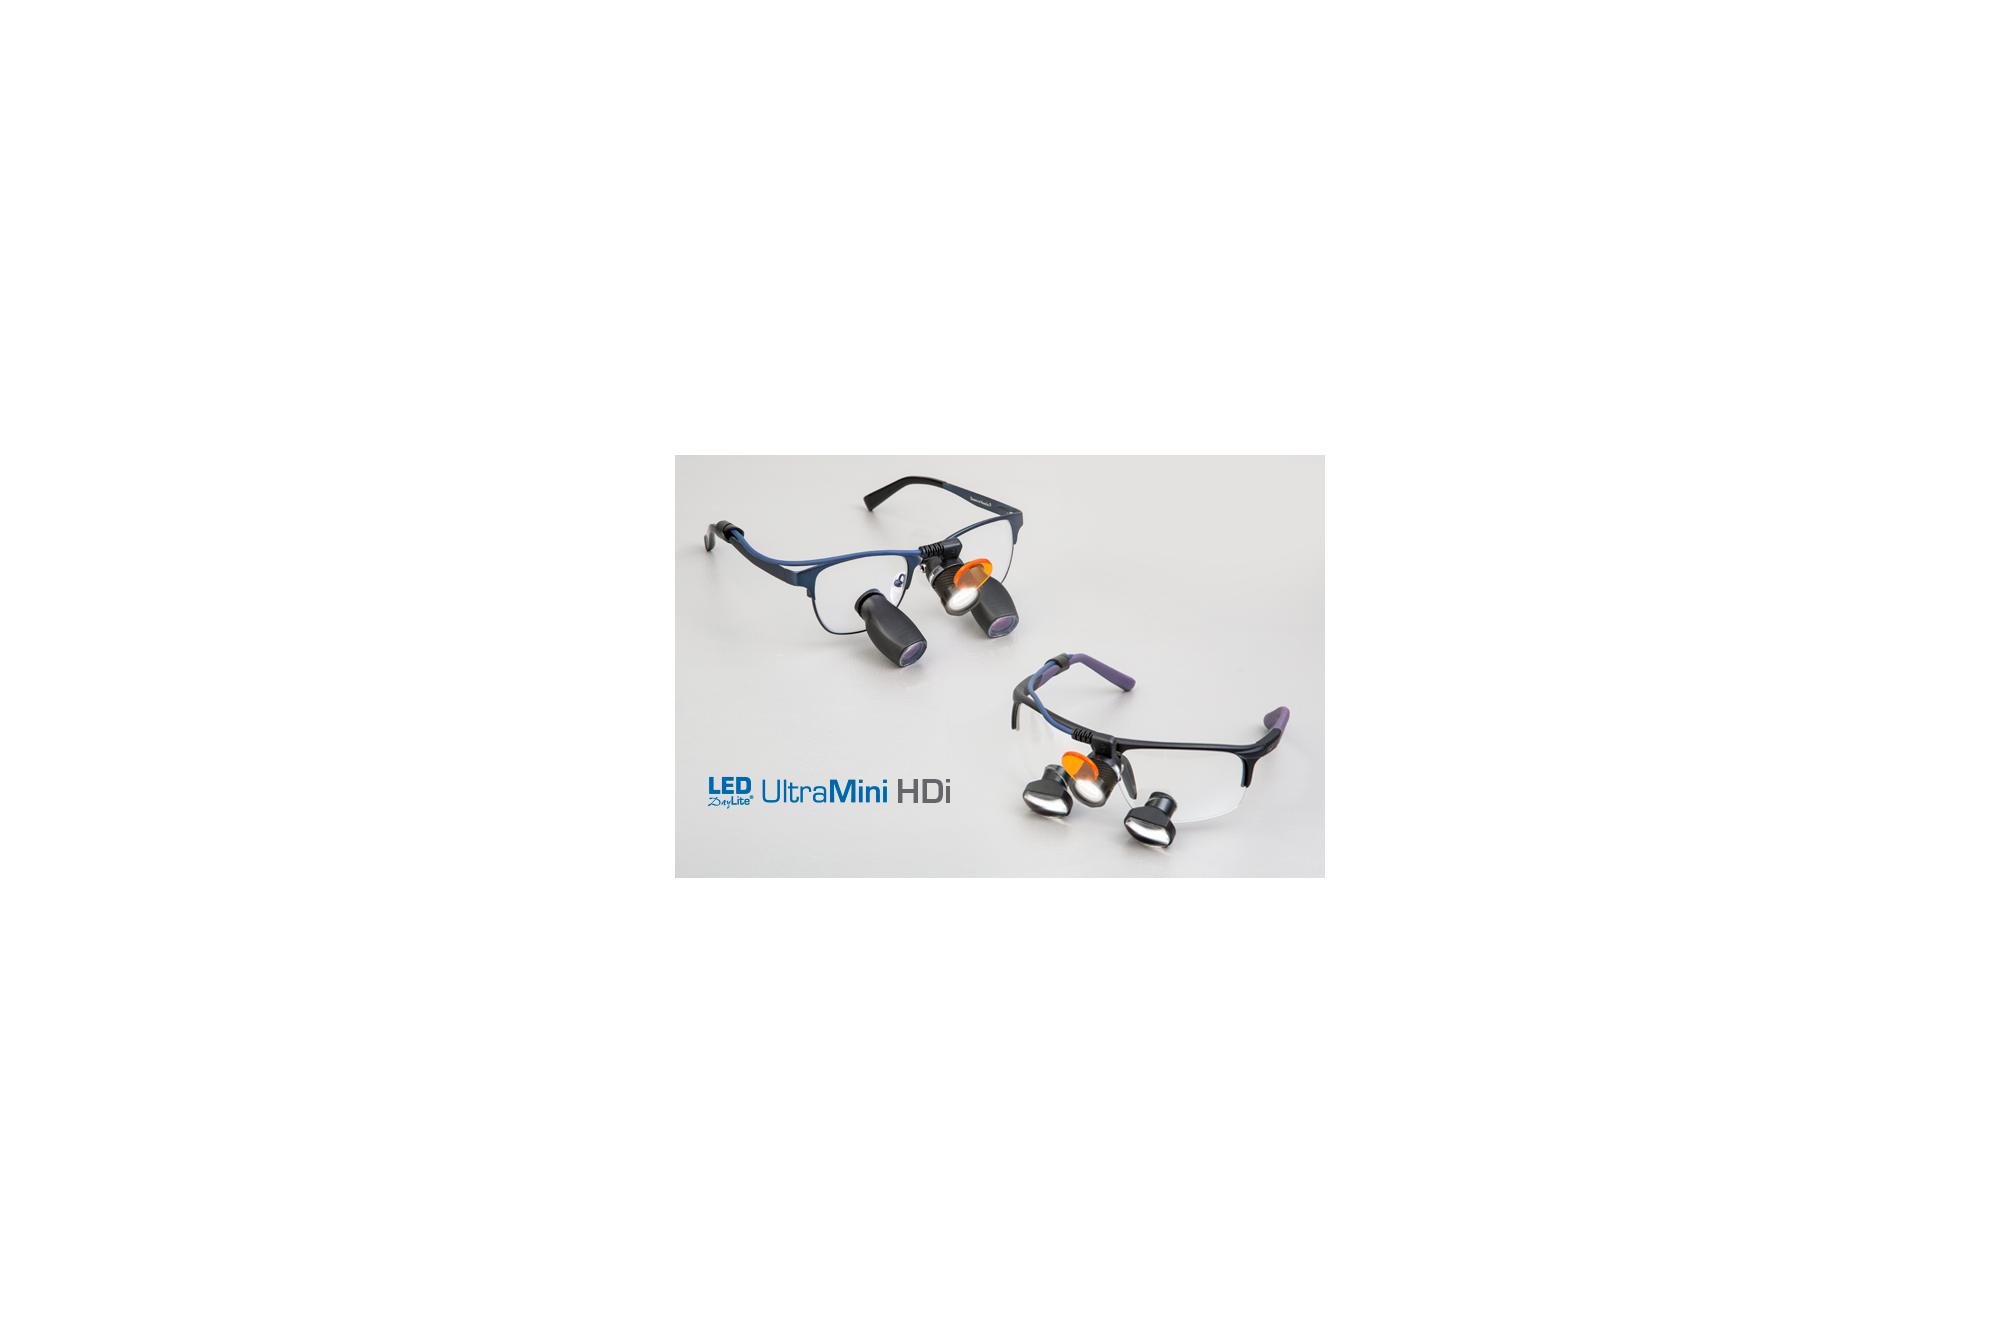 Designs for Vision Lupenbrillen: Beleuchtungssystem LED DayLite® UltraMini HDi